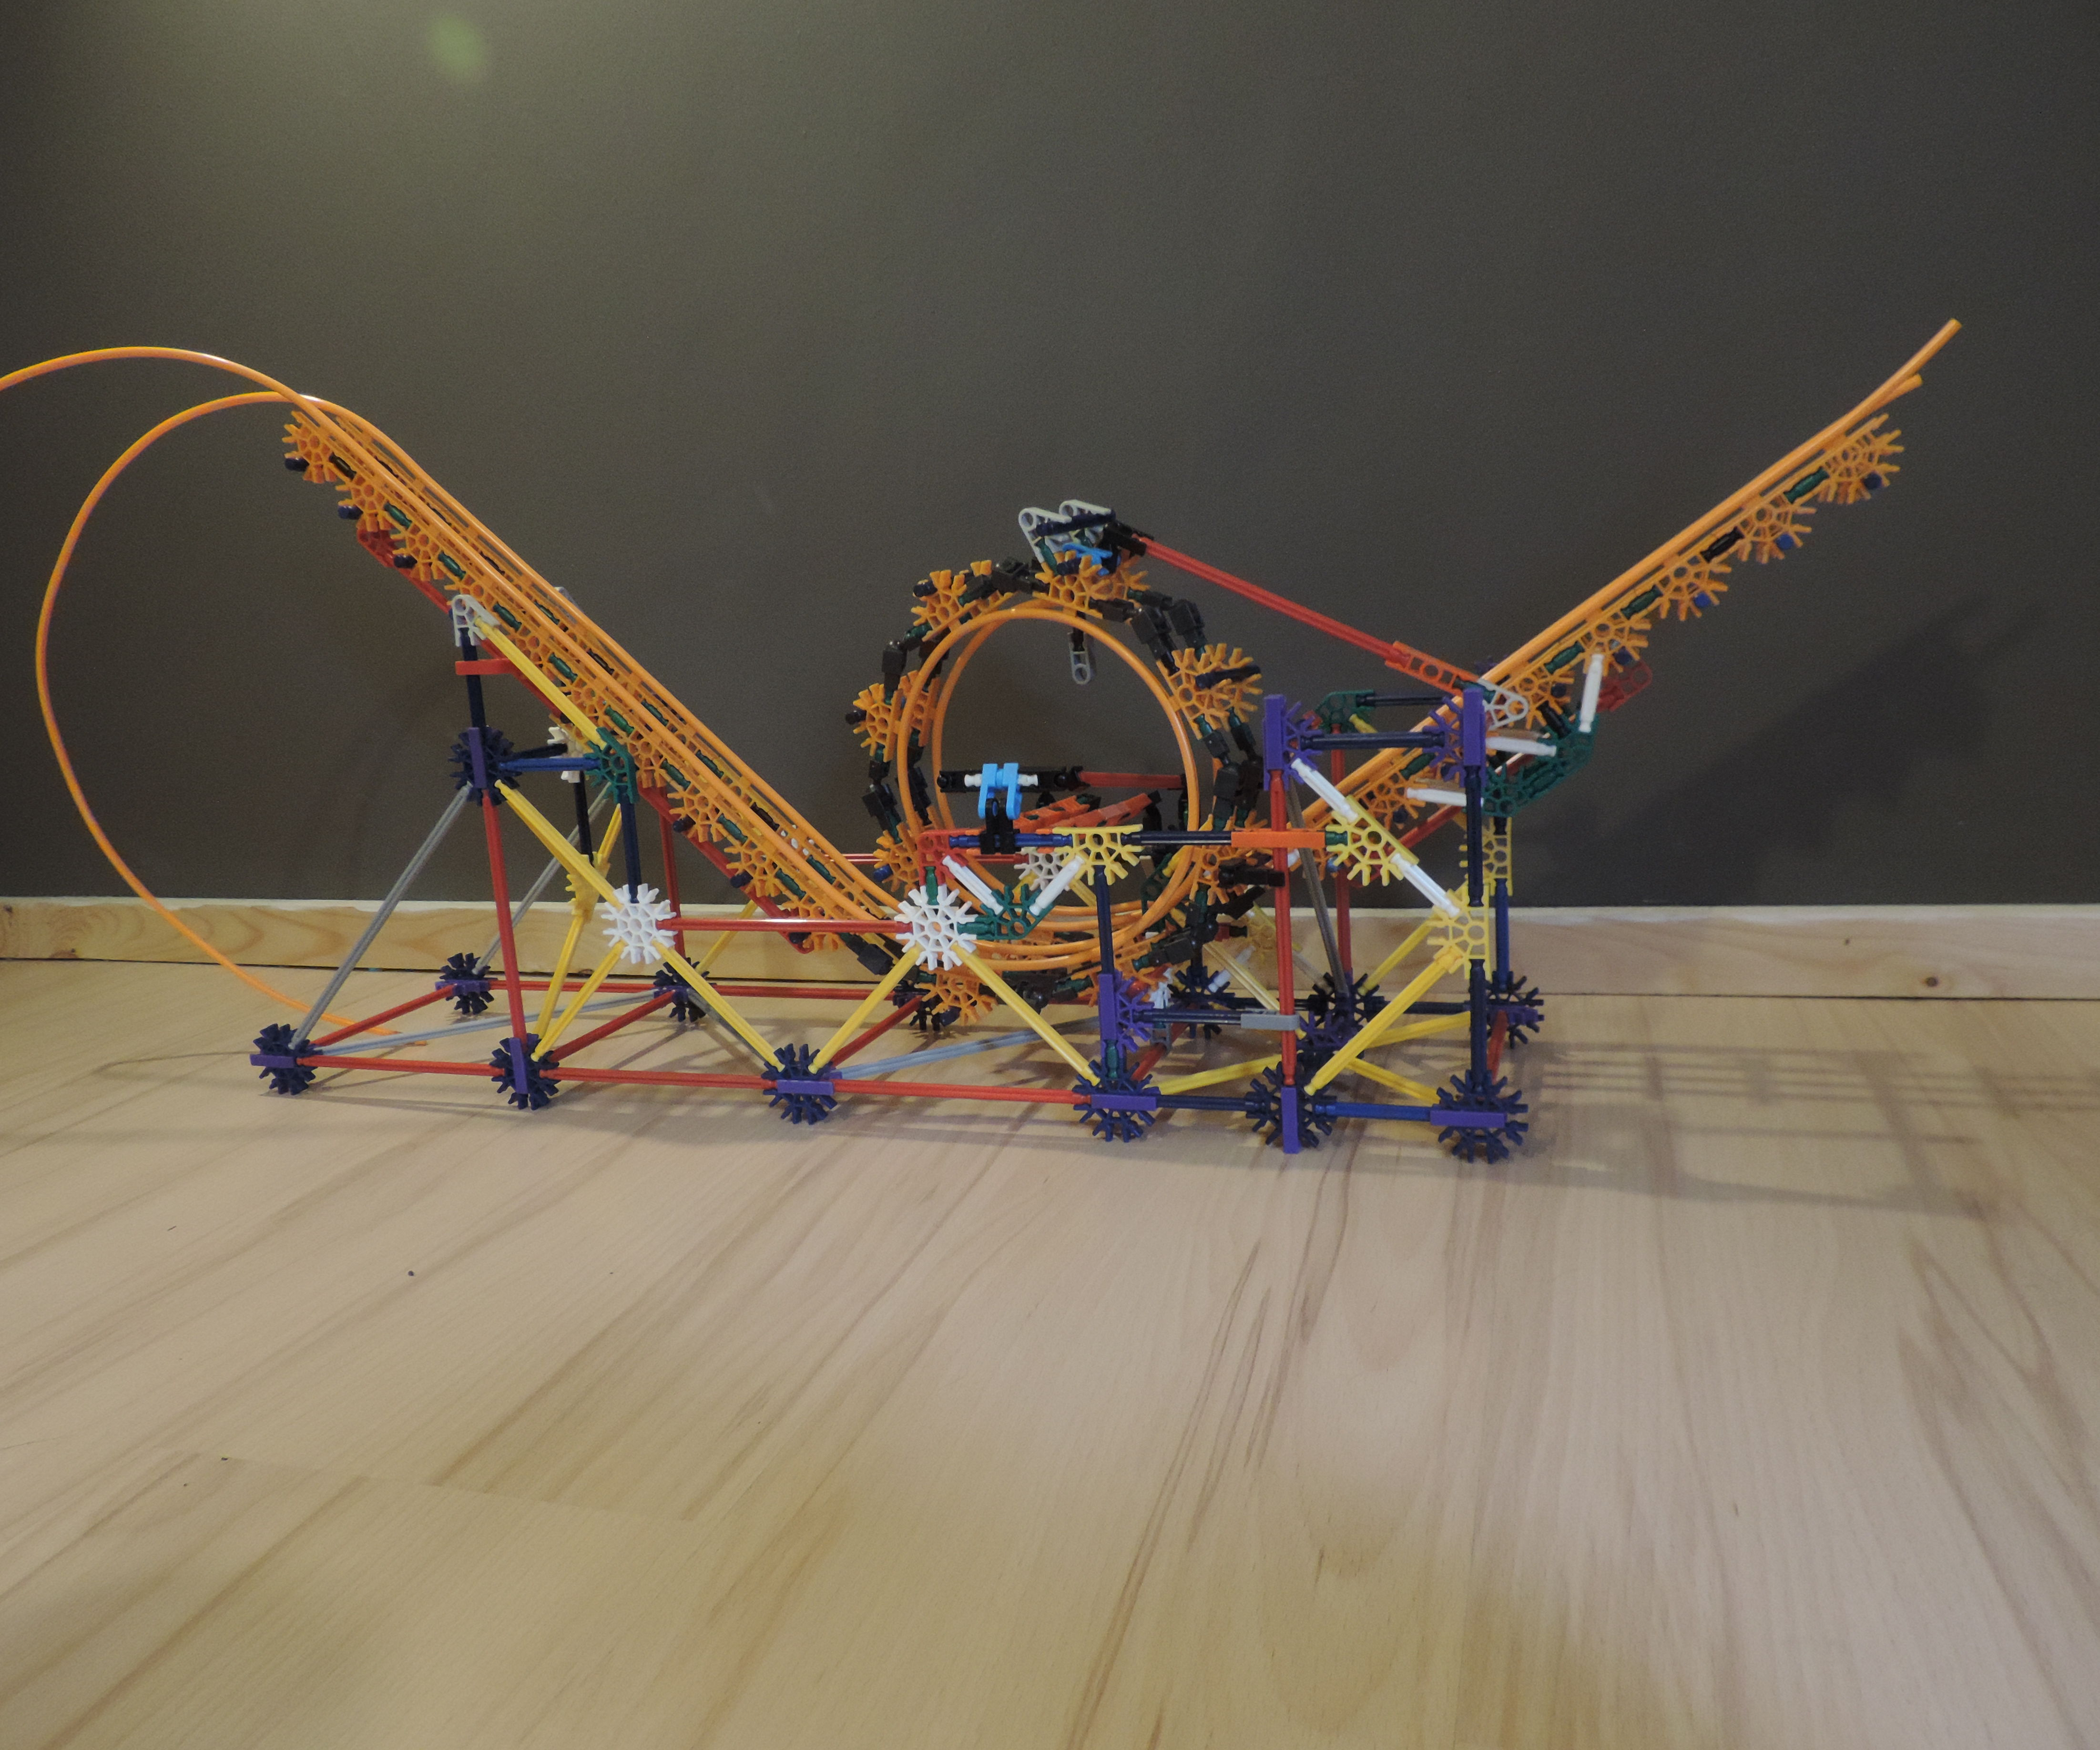 Knex Ball Machine Element: Roll-Back Loop